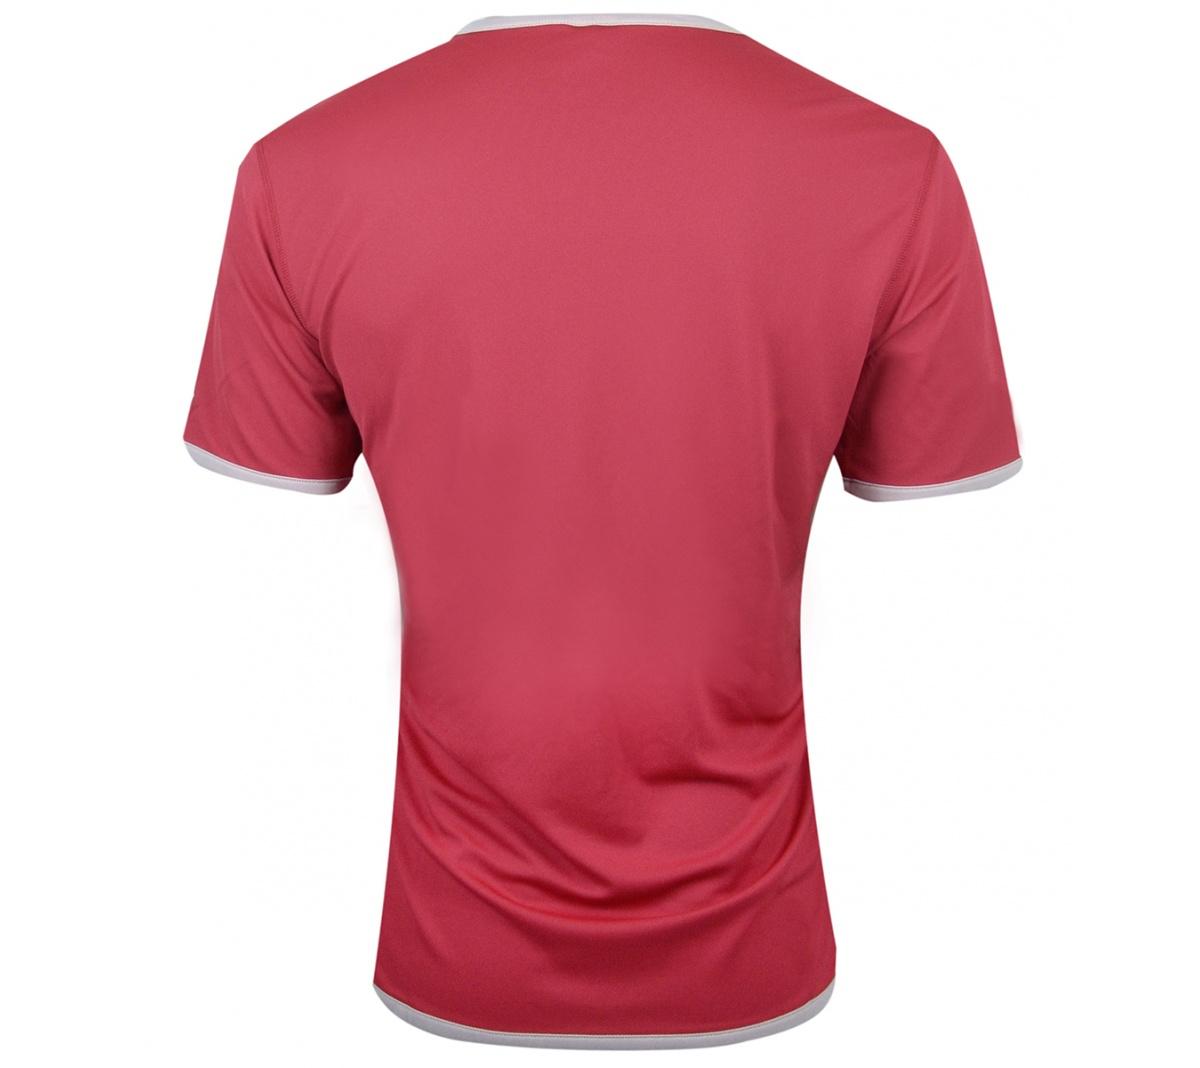 Camisa Nike SS Reversible Cinza   Vermelho - Mundo do Futebol 6b829d4824c7d